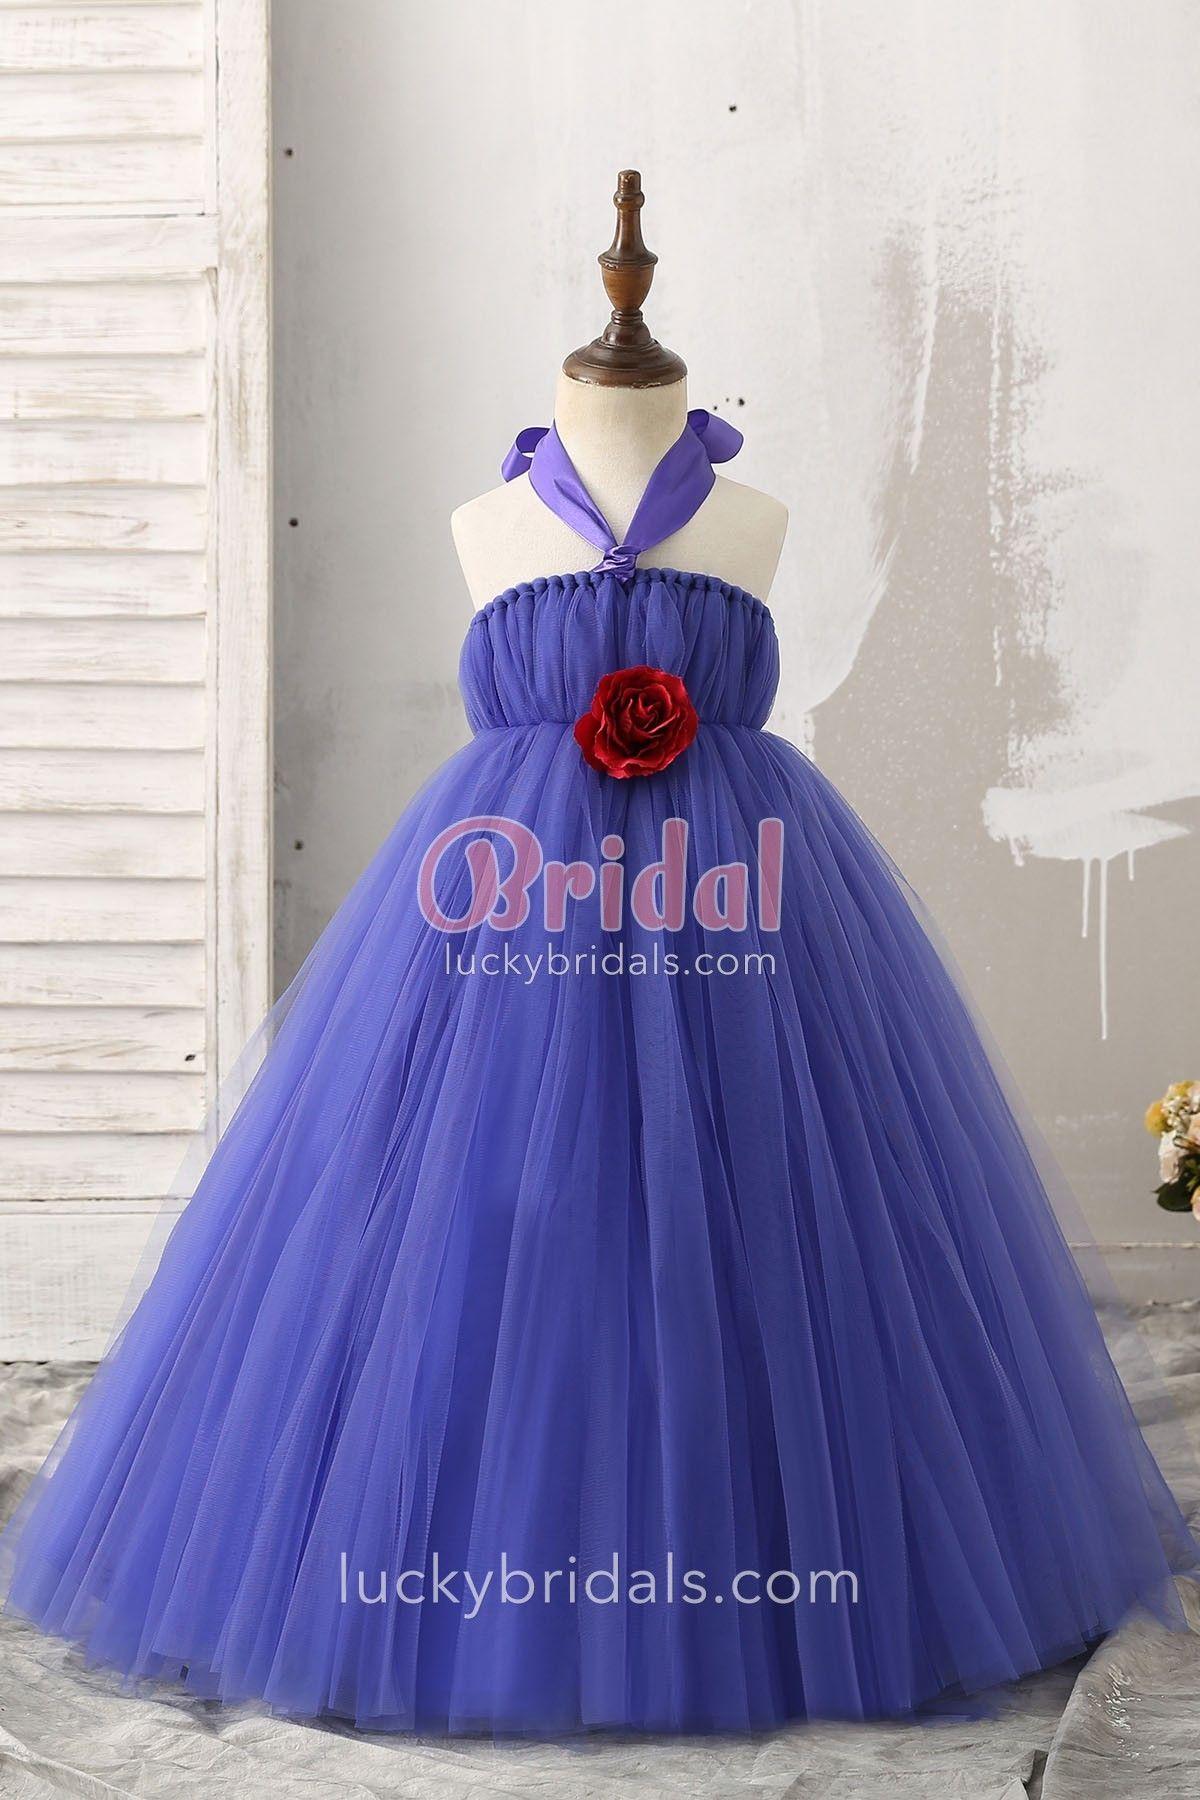 8432075cdd0b Cute 3D Rose Embellished Halter Ball Gown Grape Blue Tulle Flower ...